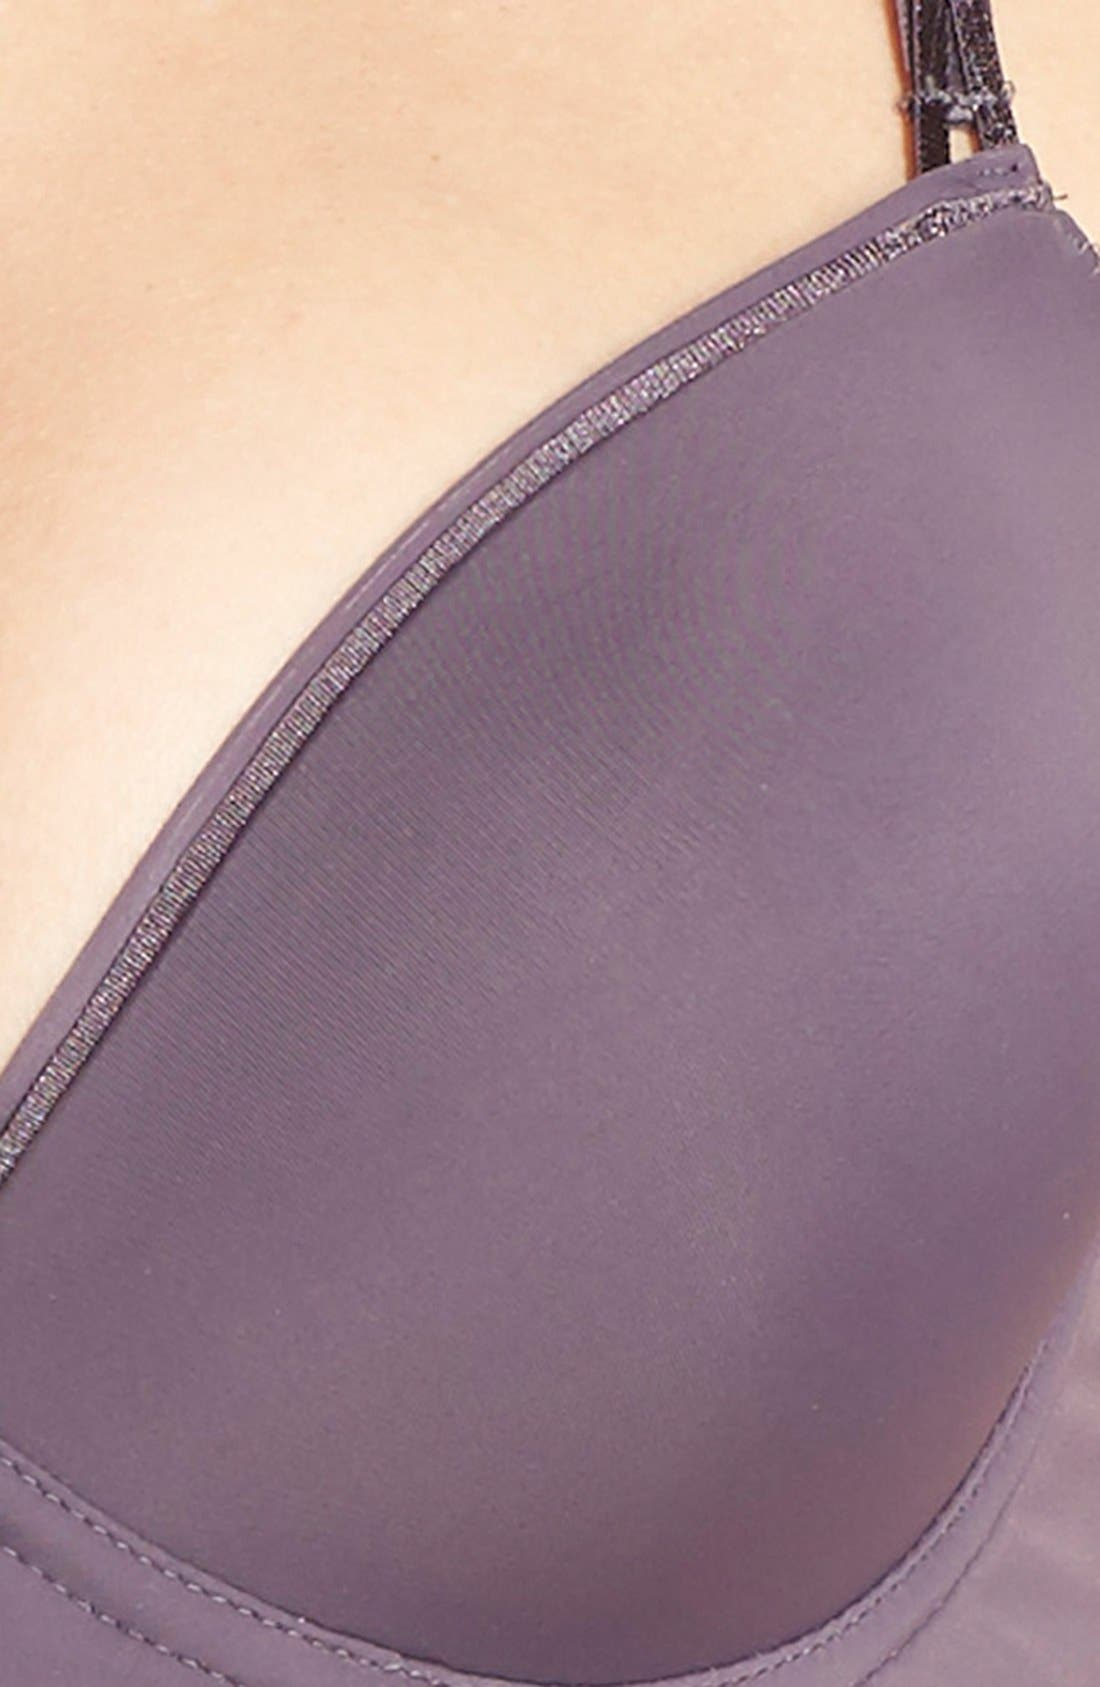 'Seductive Comfort - Customized Lift' Underwire Bra,                             Alternate thumbnail 92, color,